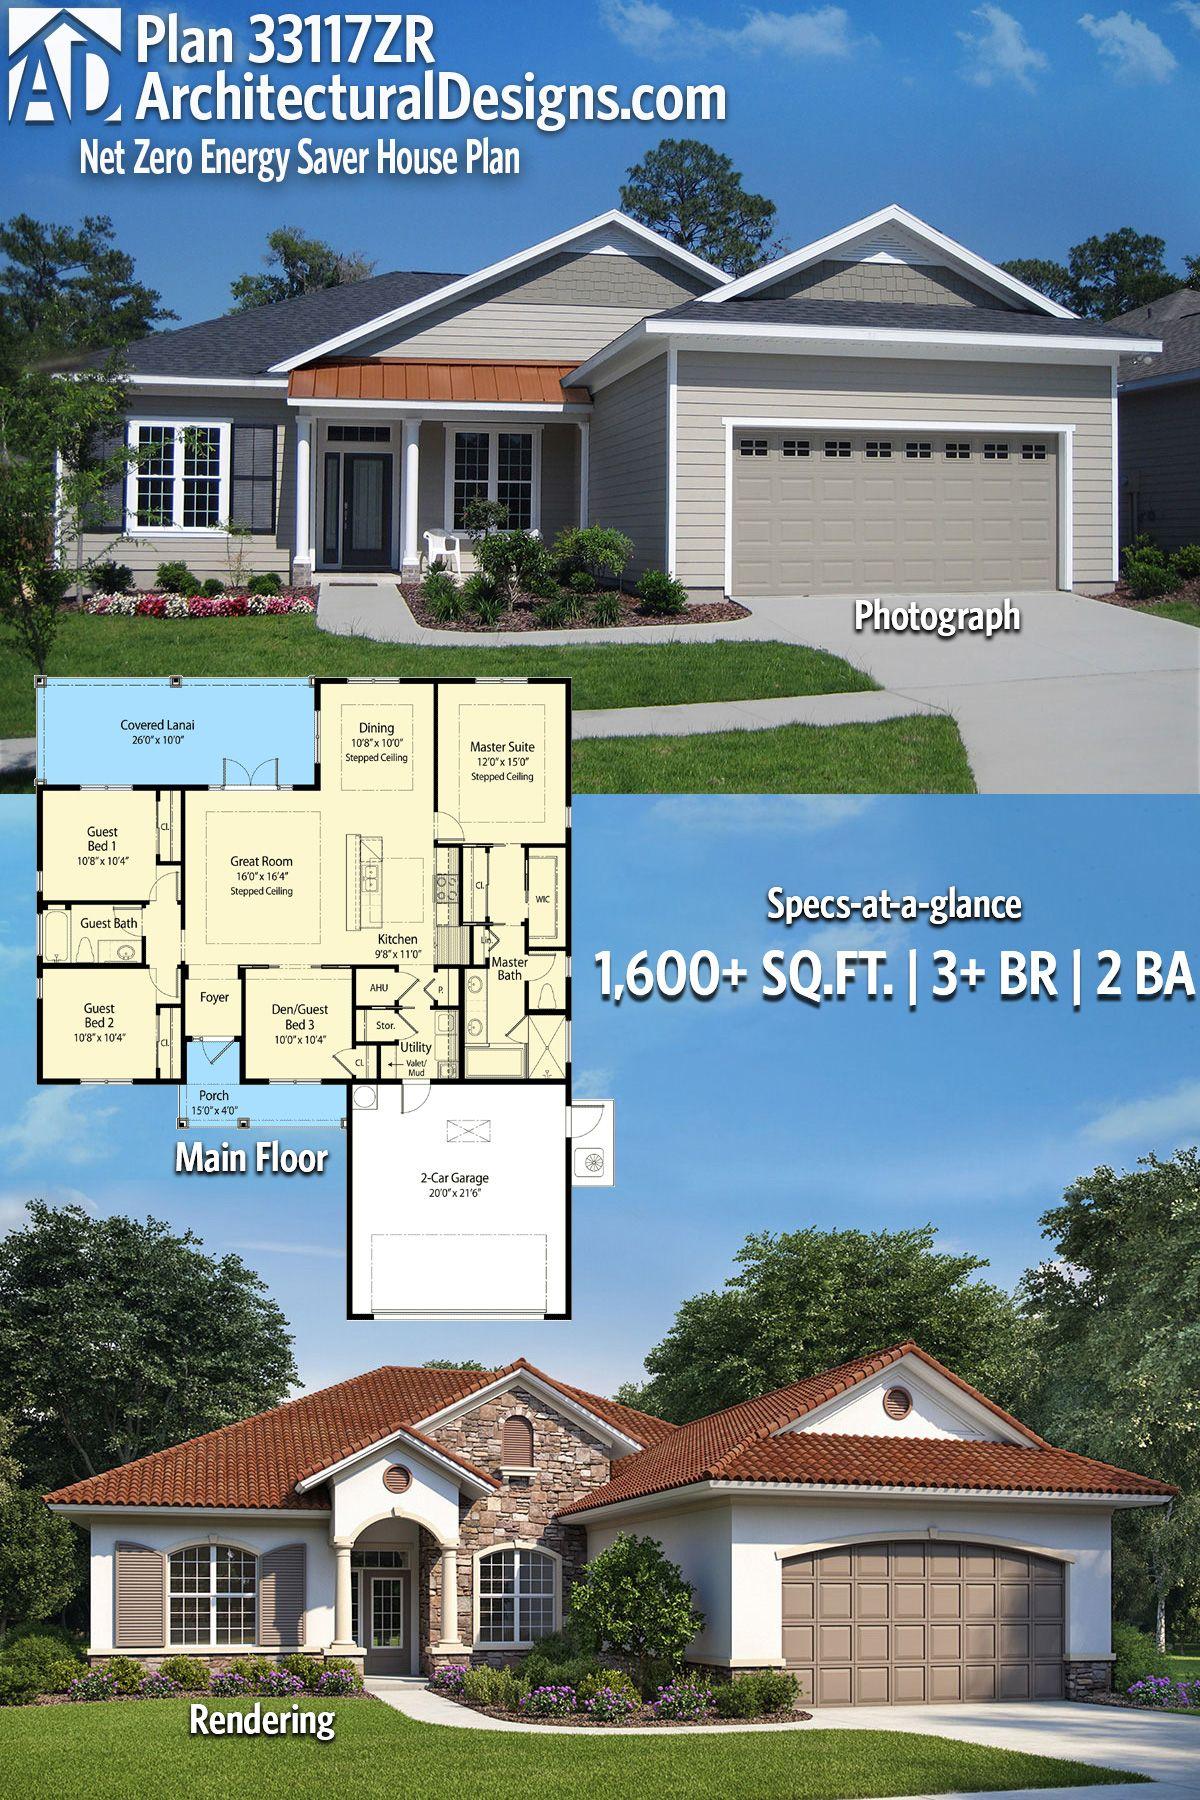 Plan 33117zr Net Zero Energy Saver House Plan Model House Plan Craftsman House Plans New Model House